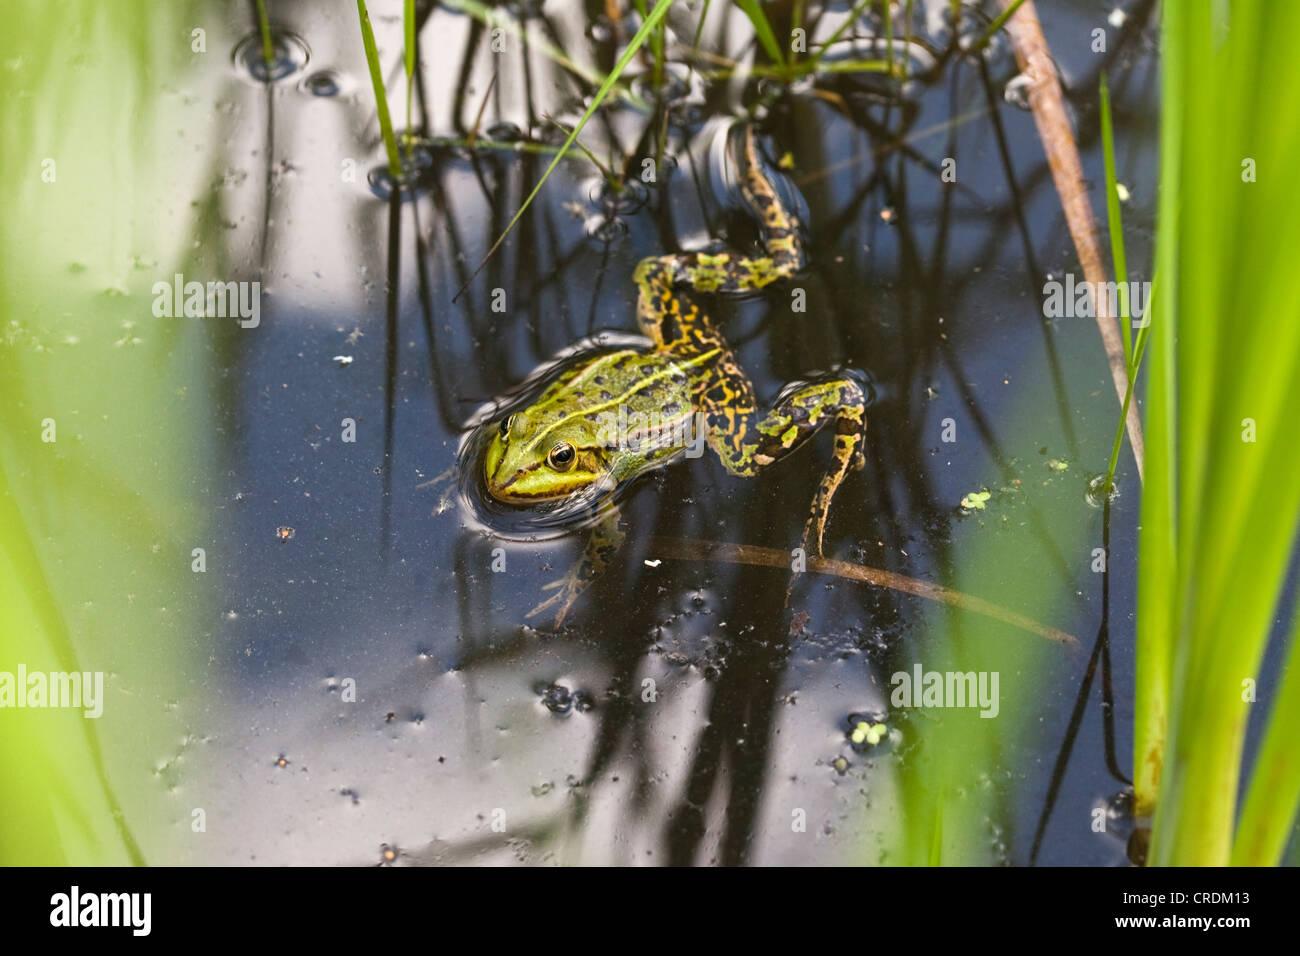 Edible Frog (Pelophylax kl. esculentus), Finowfurt, Brandenburg, Germany, Europe - Stock Image